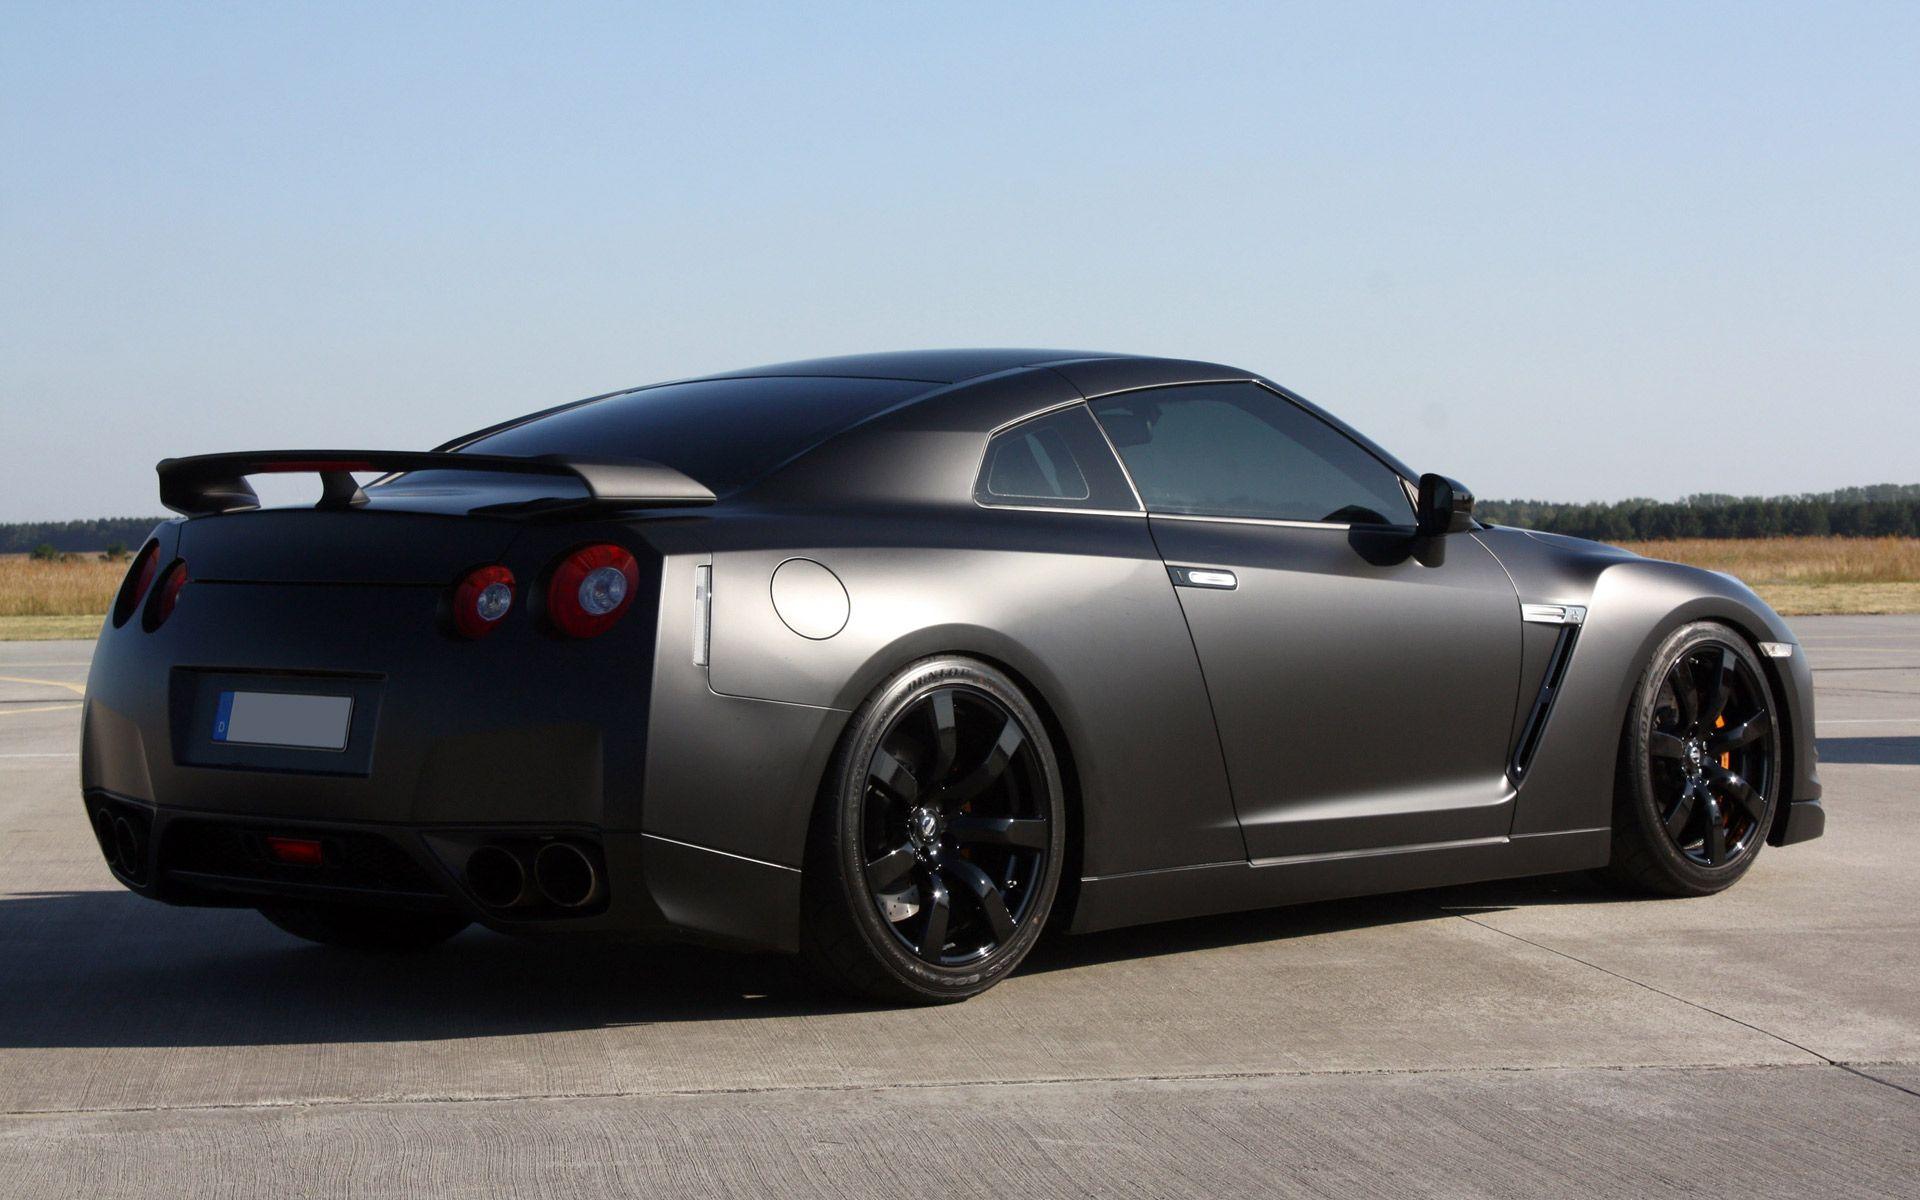 Nissan nissan deportivos nissan gt r nissan gt r r35 tuning cars - Nissan Gtr Black Edition